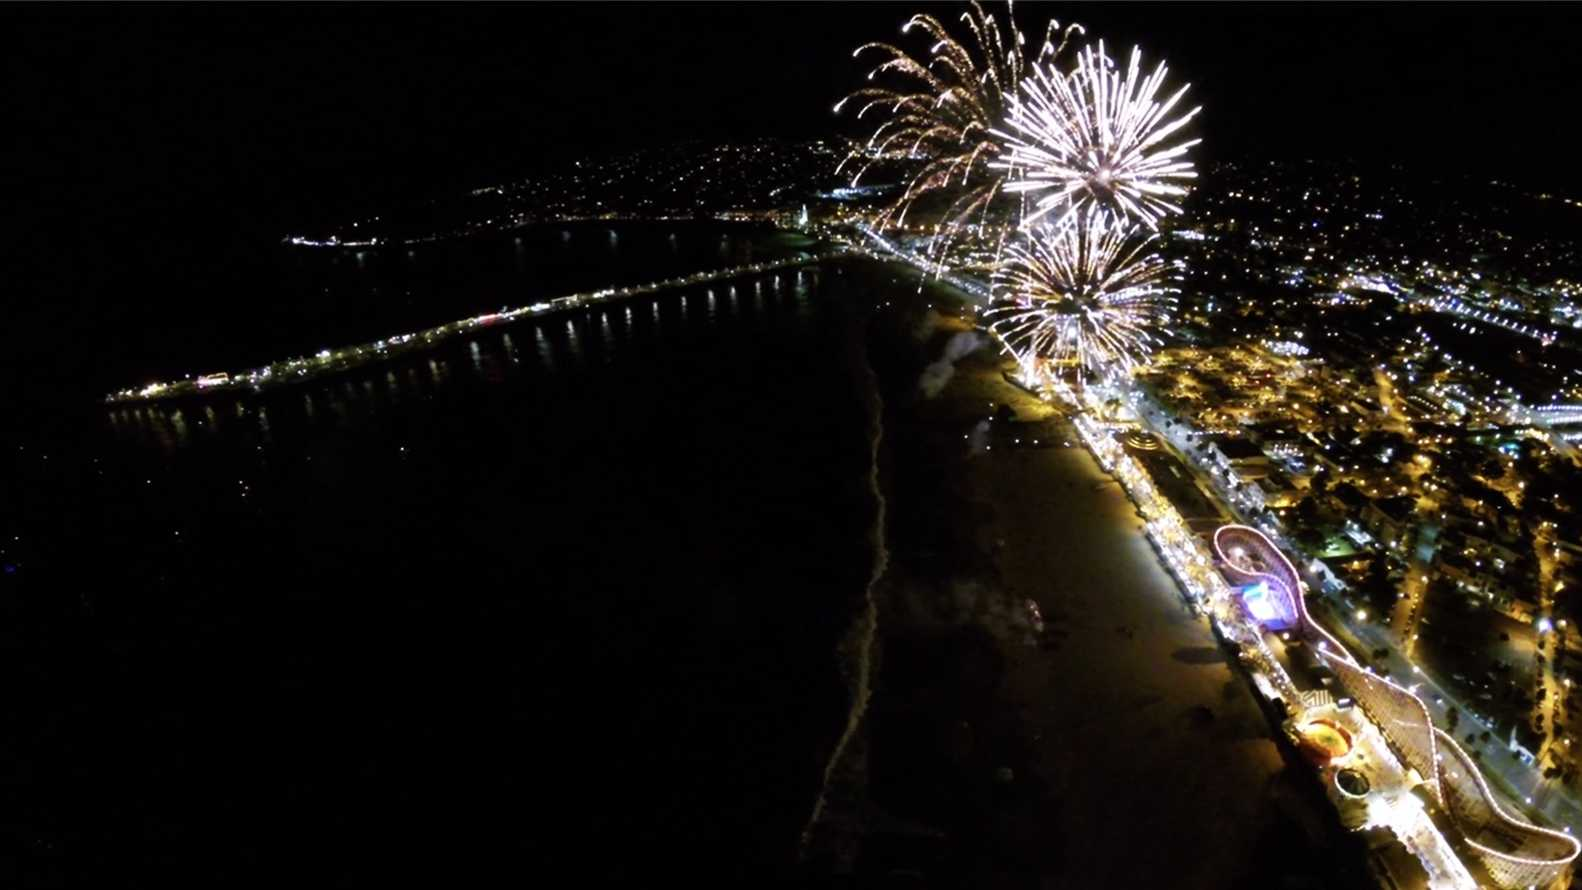 The Santa Cruz Wharf turned 100 this year.